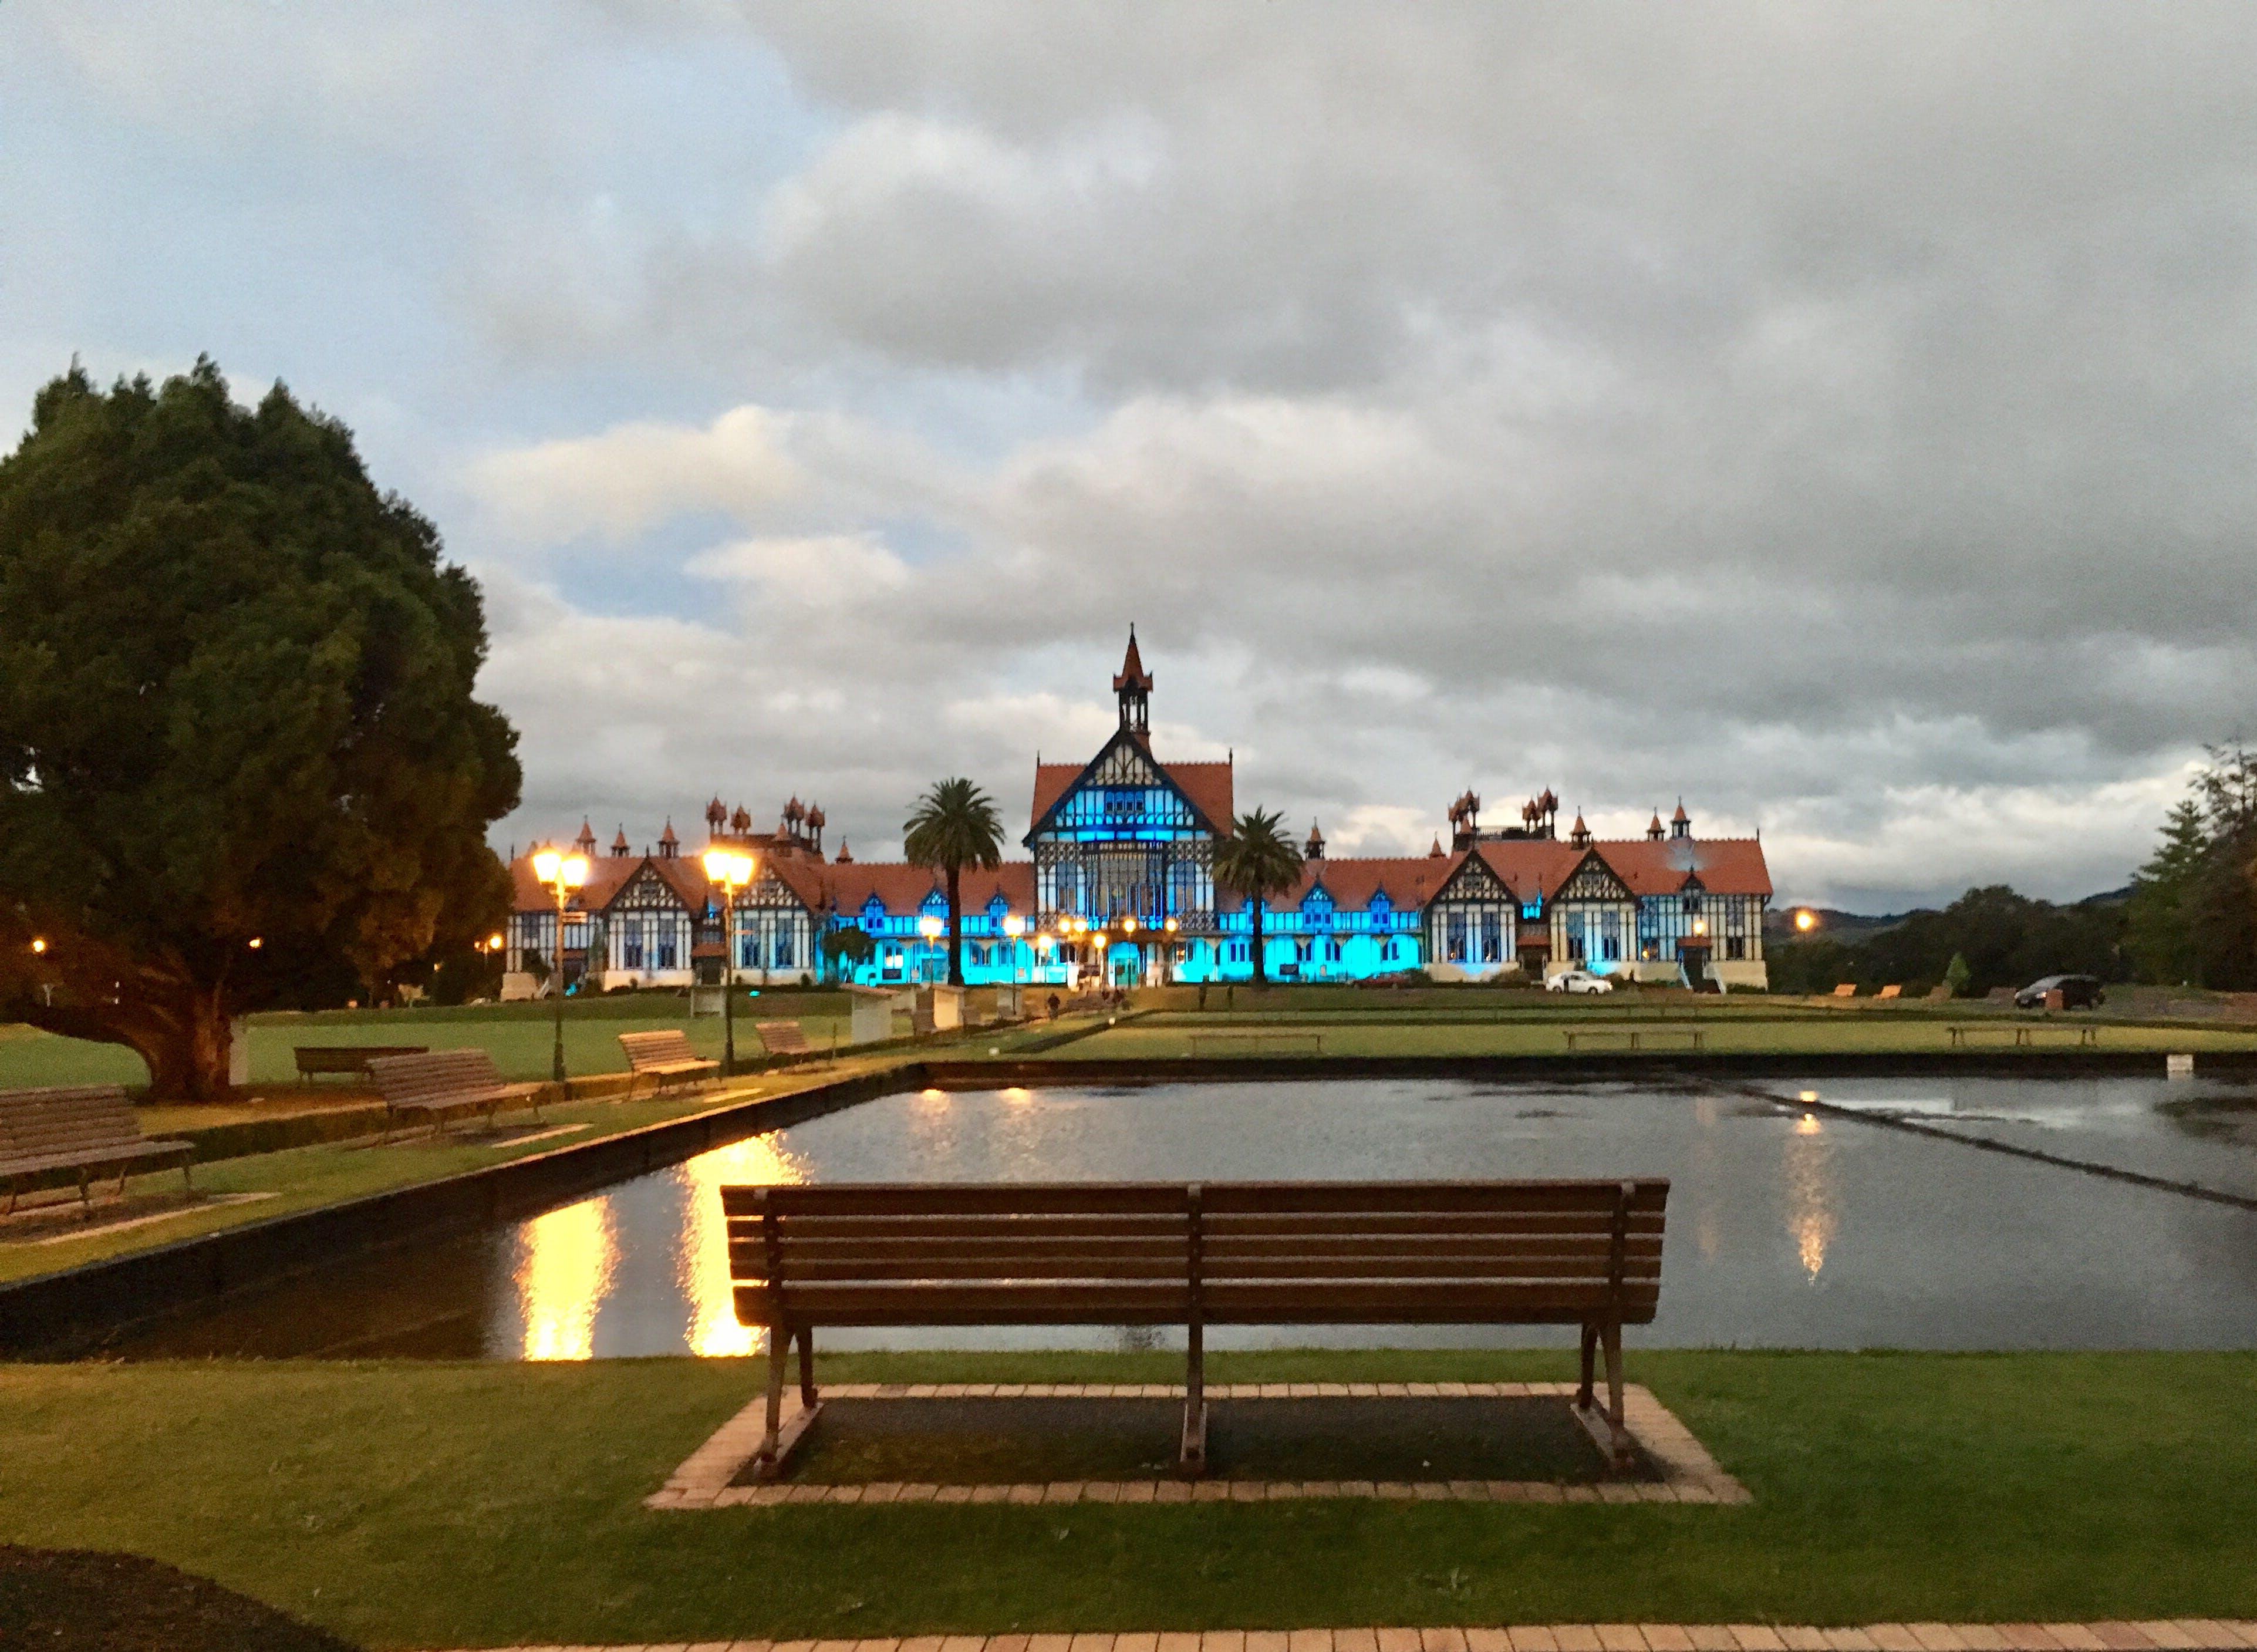 #24 Beauty of Rotorua